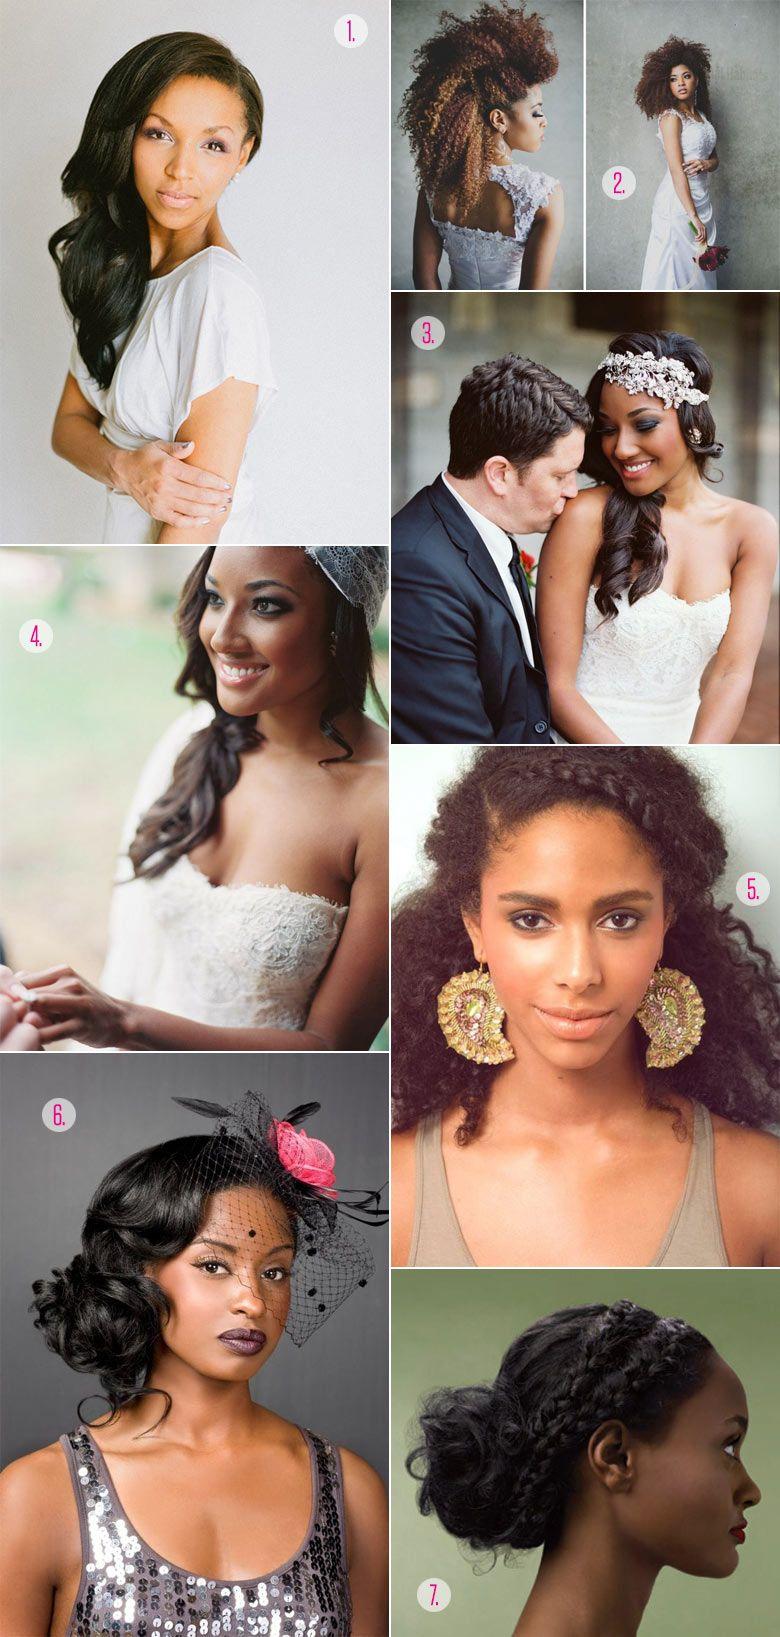 Open Hair Model Trends in Bridal Hair of the New Seaso